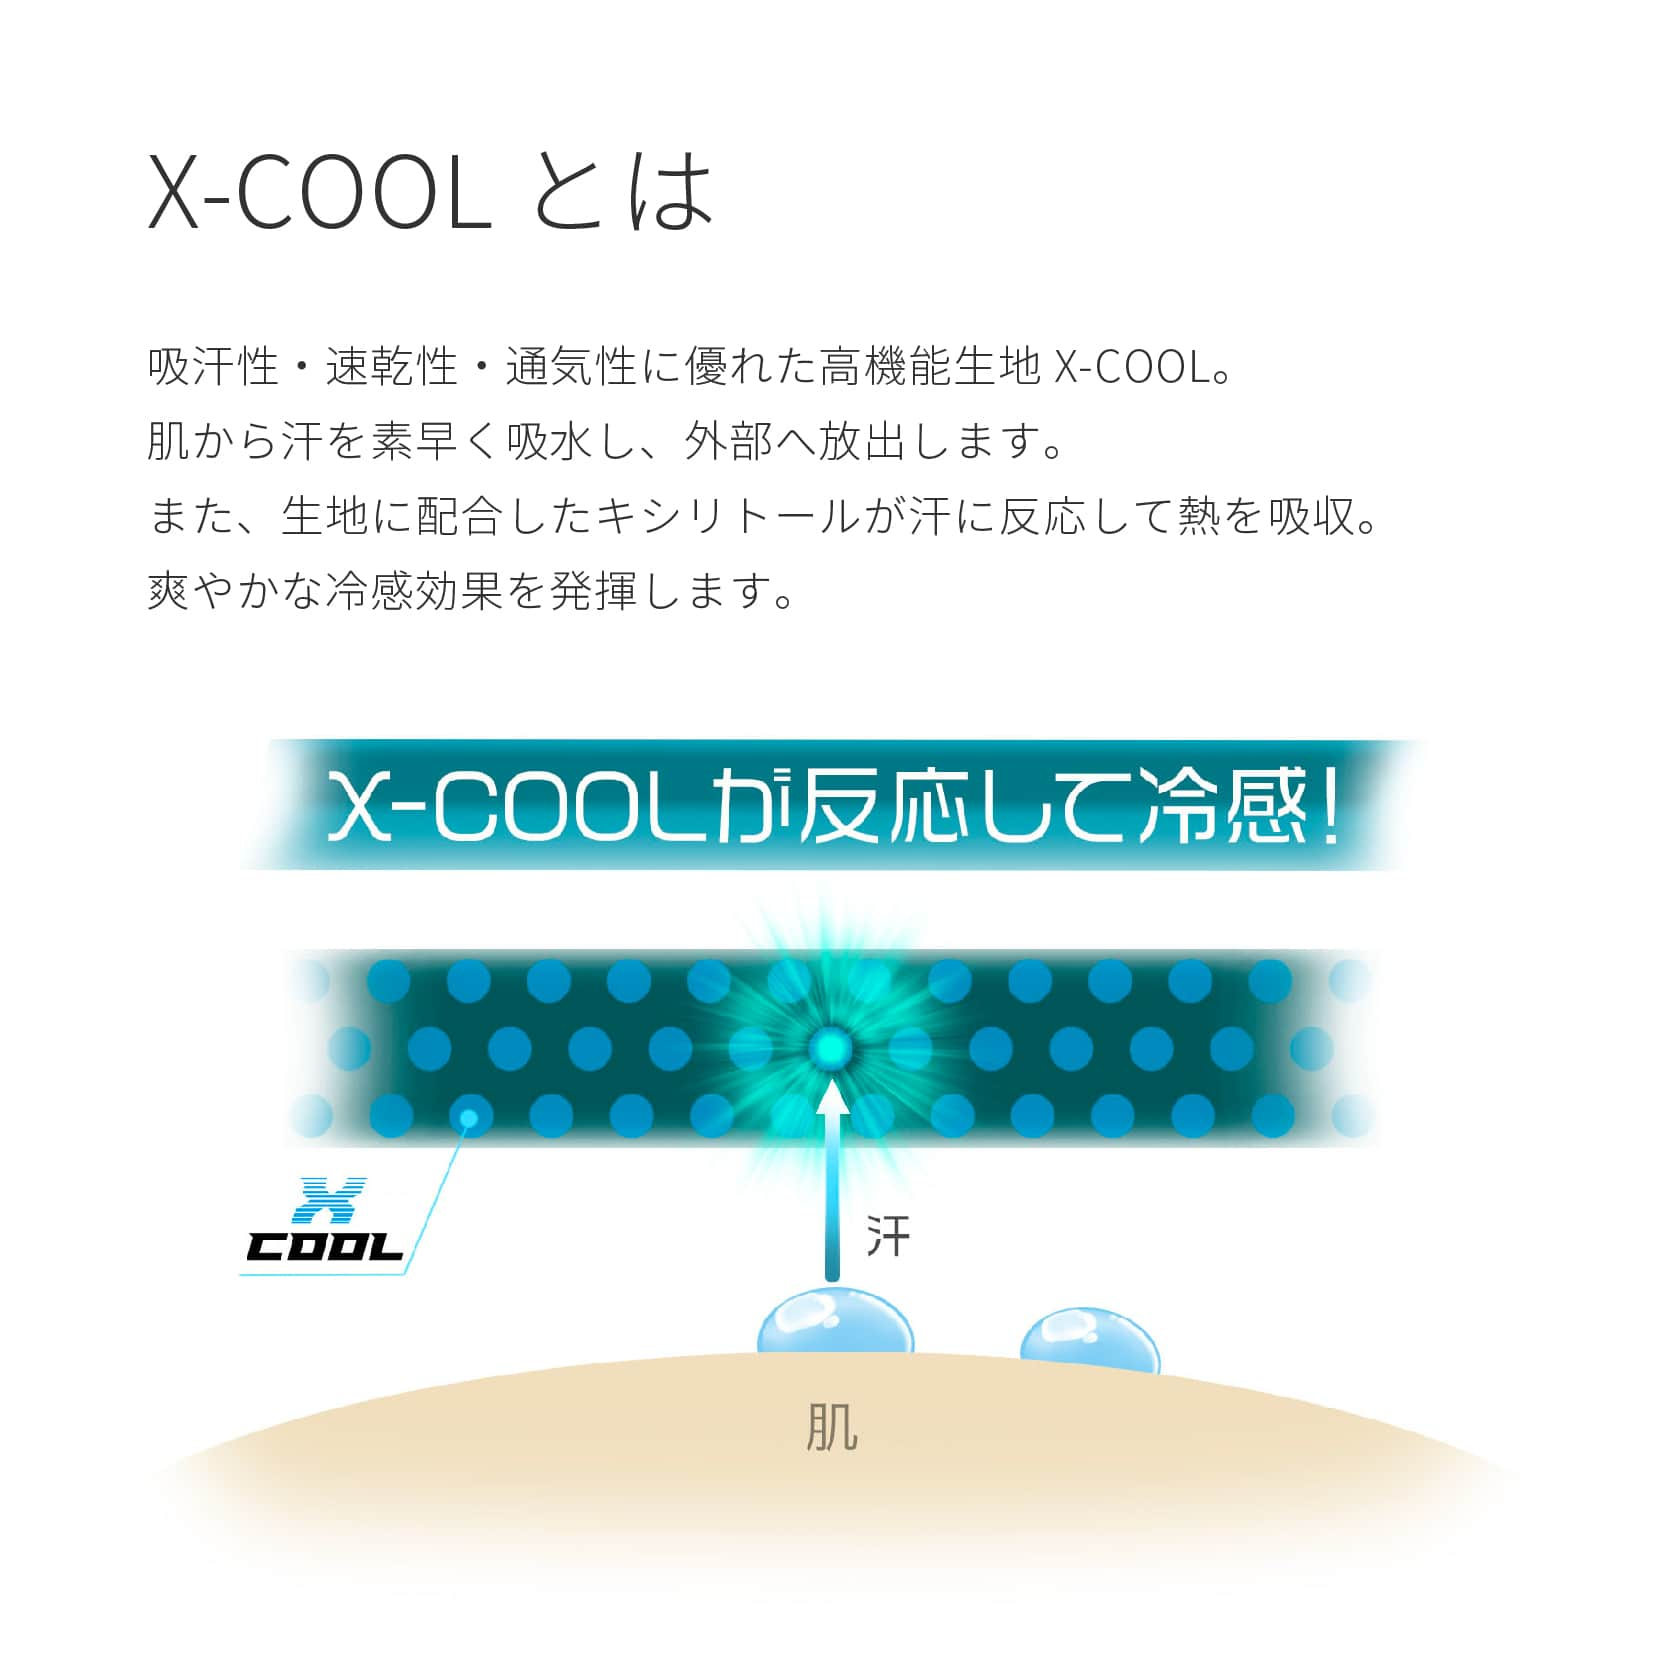 X-COOLとは